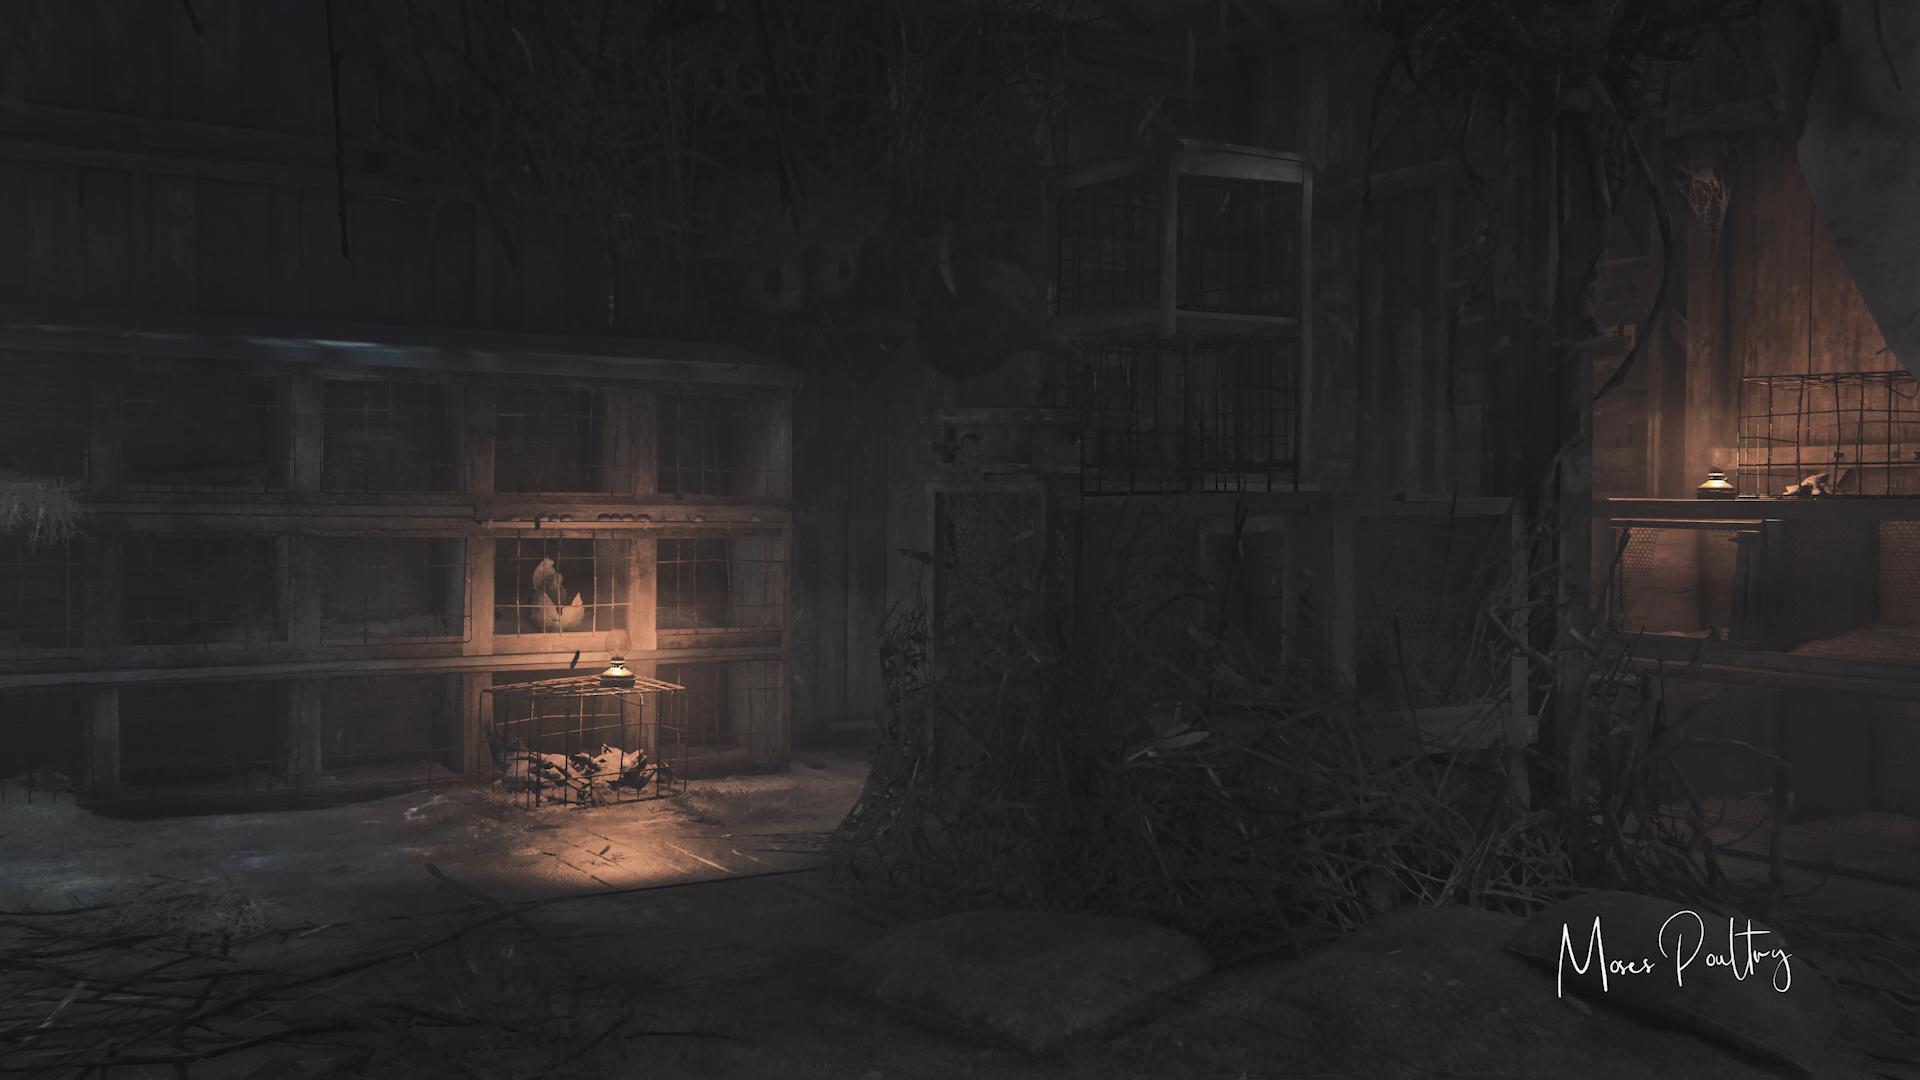 Crytek出品《猎杀:对决》1.6版本及全新地图现已登陆PC端!大表哥式恐怖西部城镇!